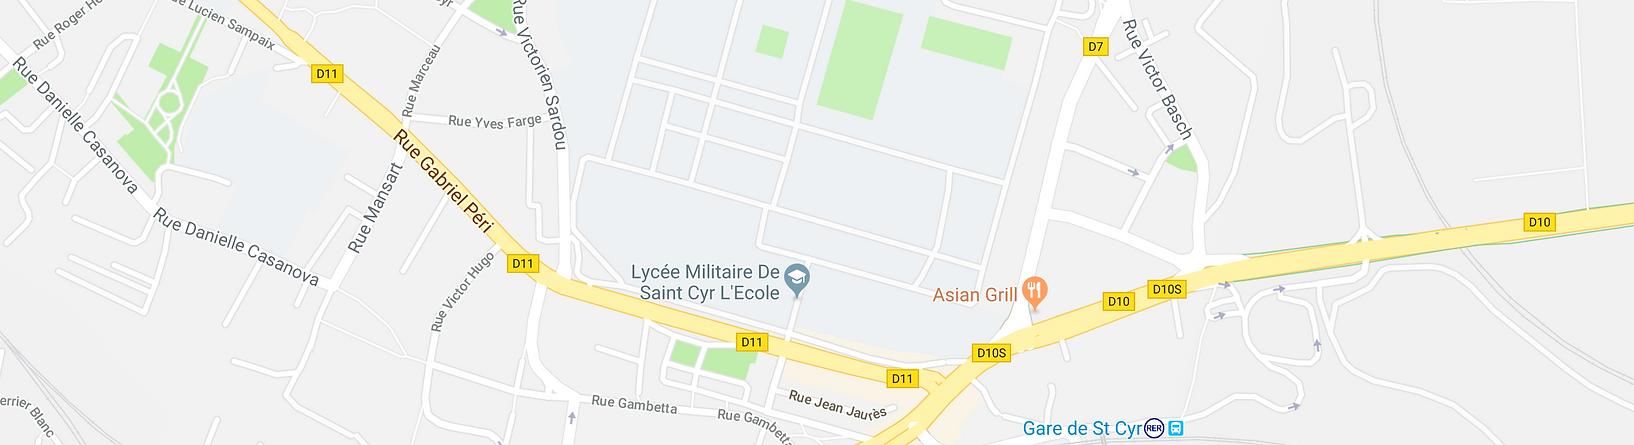 Plan Le comptoir Breton Saint Germain